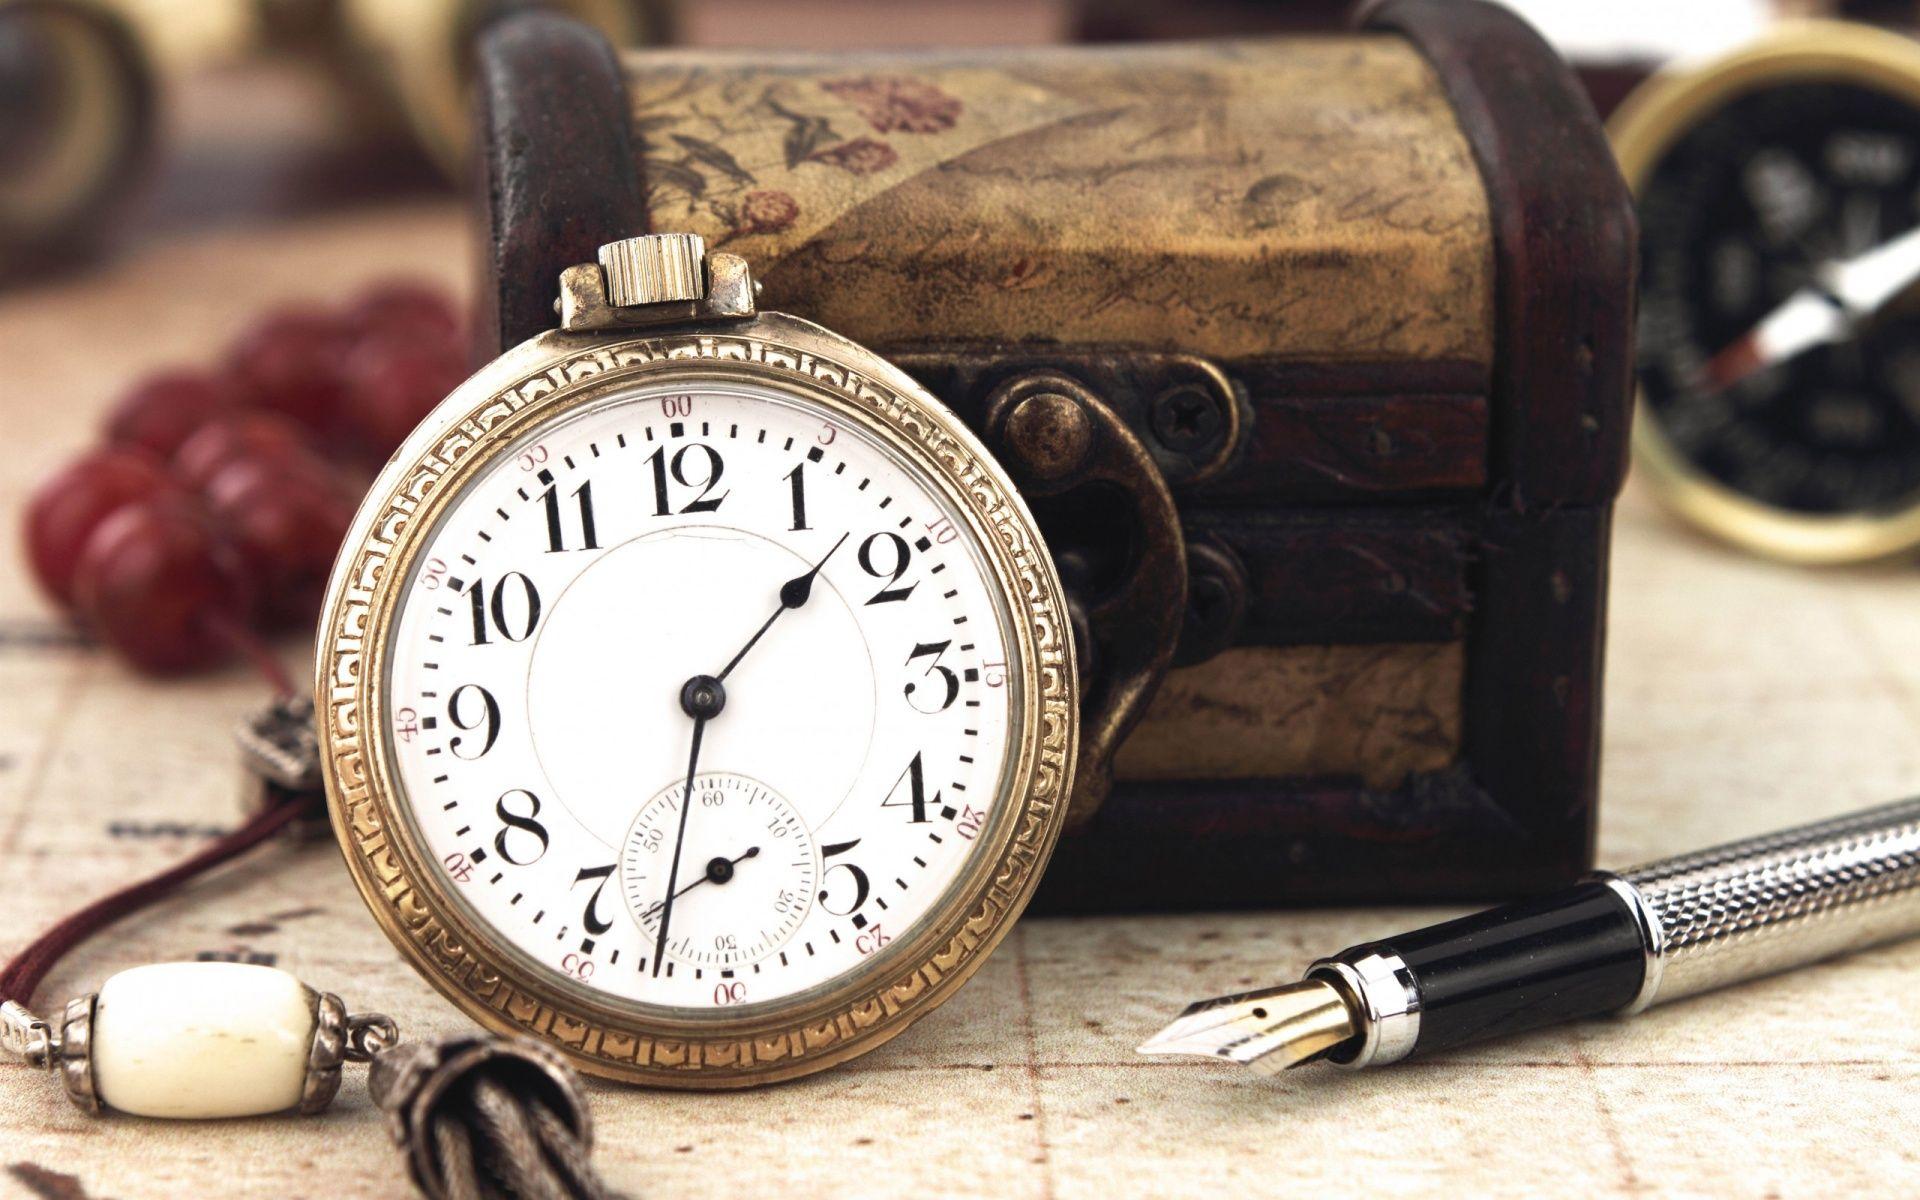 pc vintage fond d ecran d horloge en